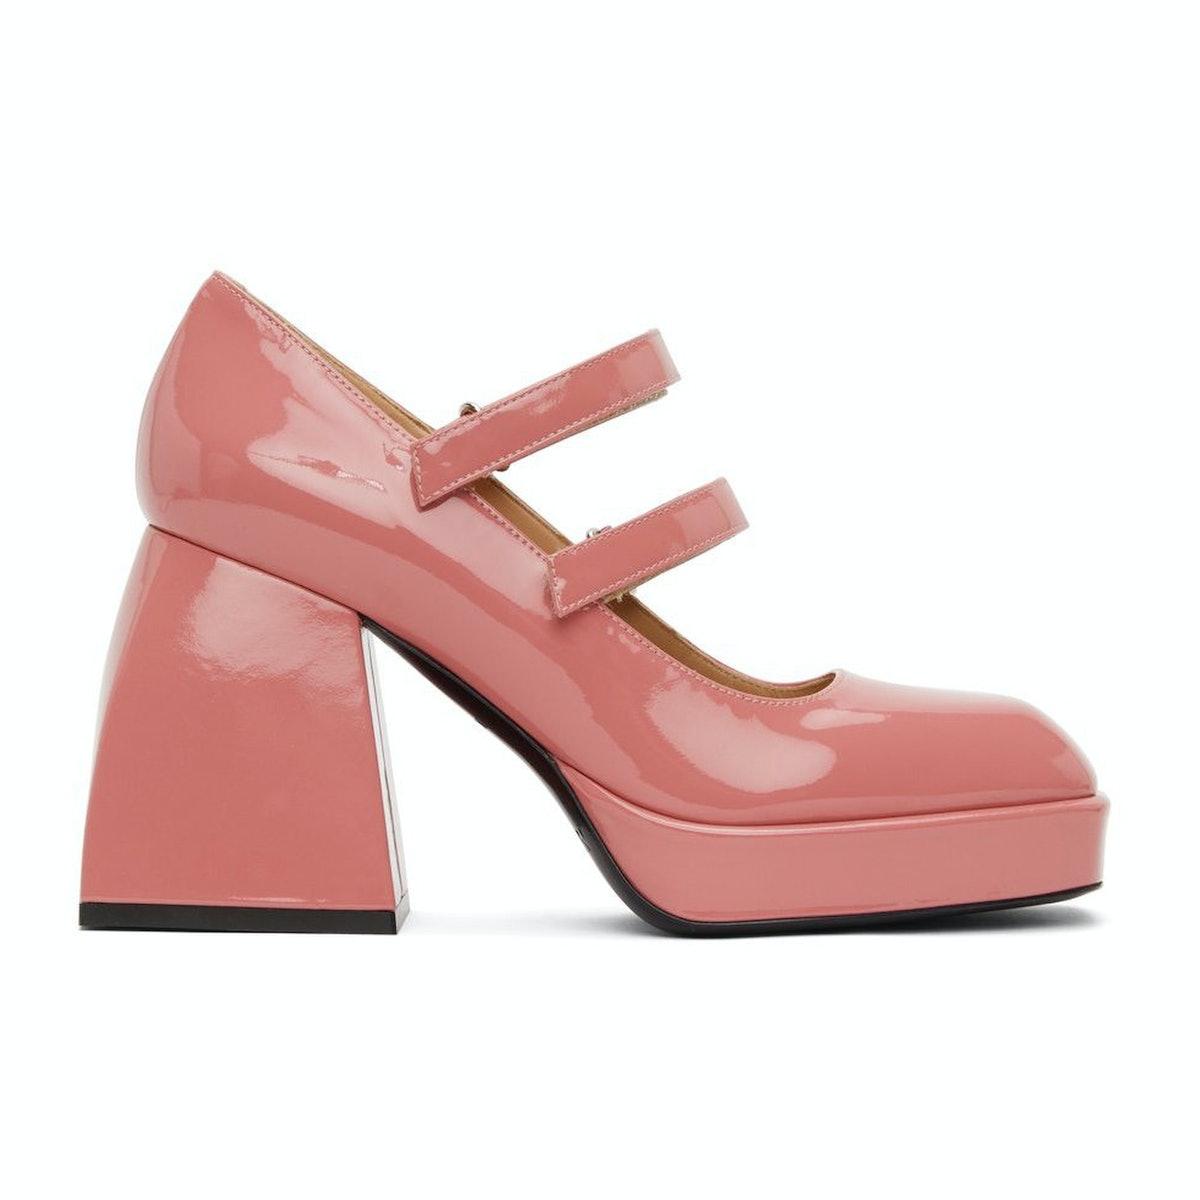 Nodaleto Pink Patent Bulla Babies 65 Heels